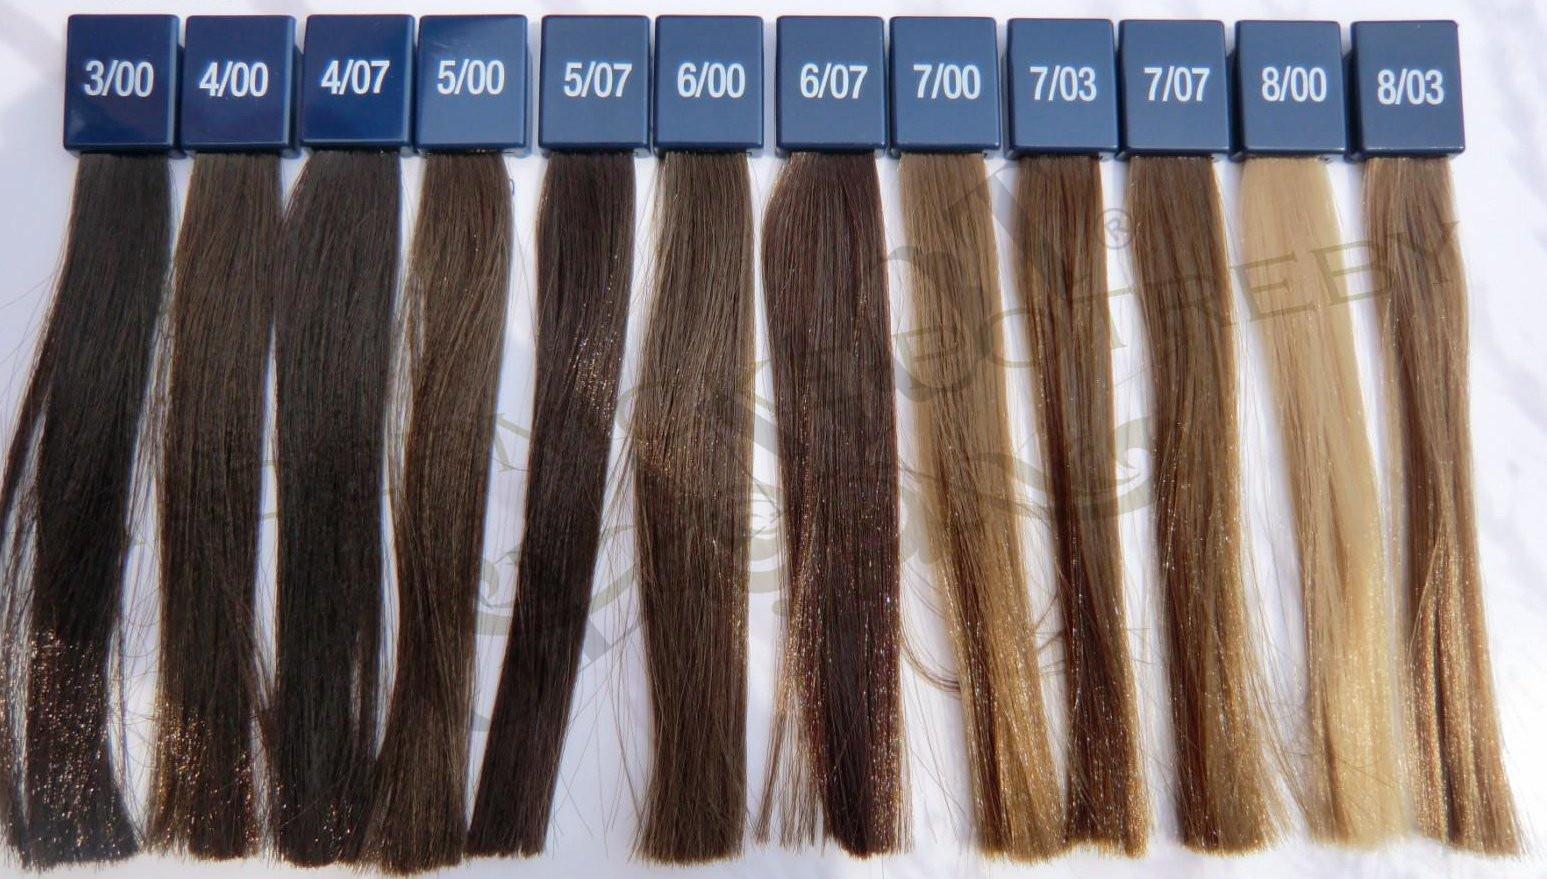 Wella professionals koleston perfect pure naturals hair colour wella professionals koleston perfect pure naturals hair colour geenschuldenfo Image collections